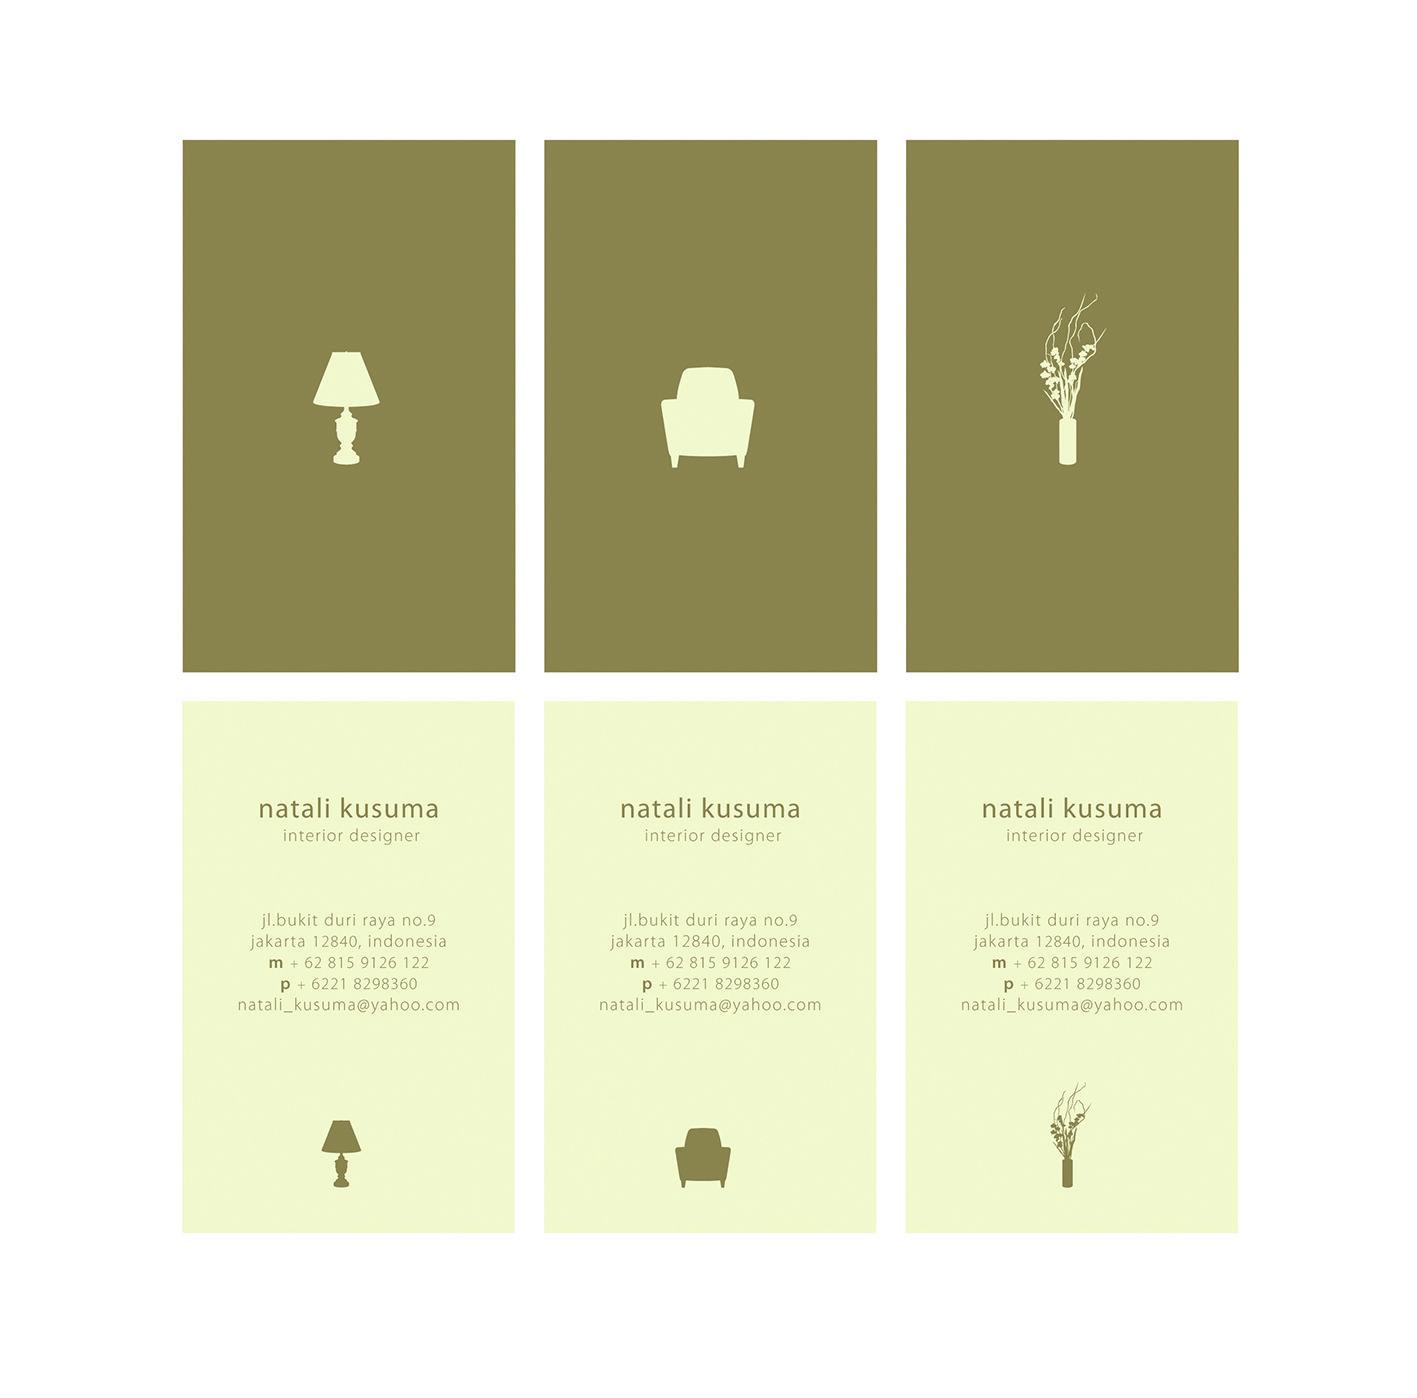 Name Card Natali Kusuma Interior Designer